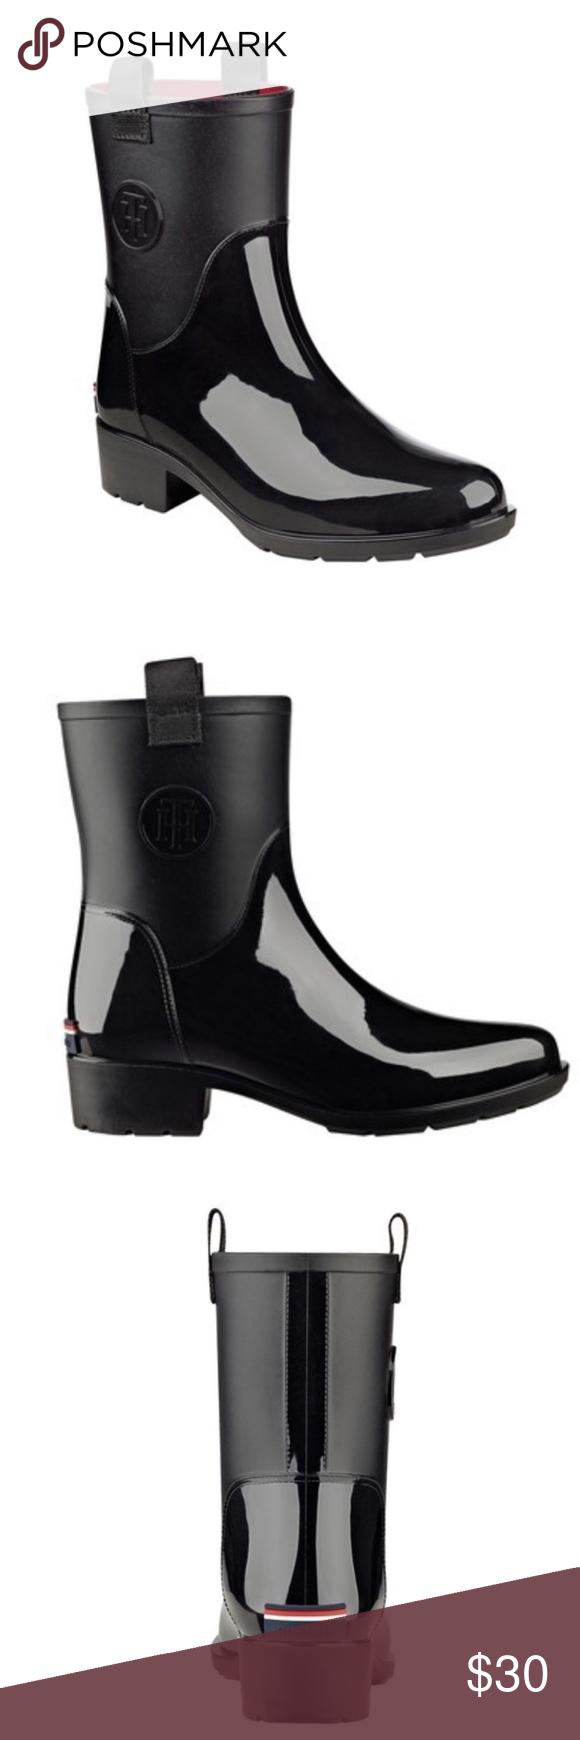 a1435916fb4 NWT! Tommy Hilfiger Khristie Rain Boots NWT! Tommy Hilfiger size 7 ...